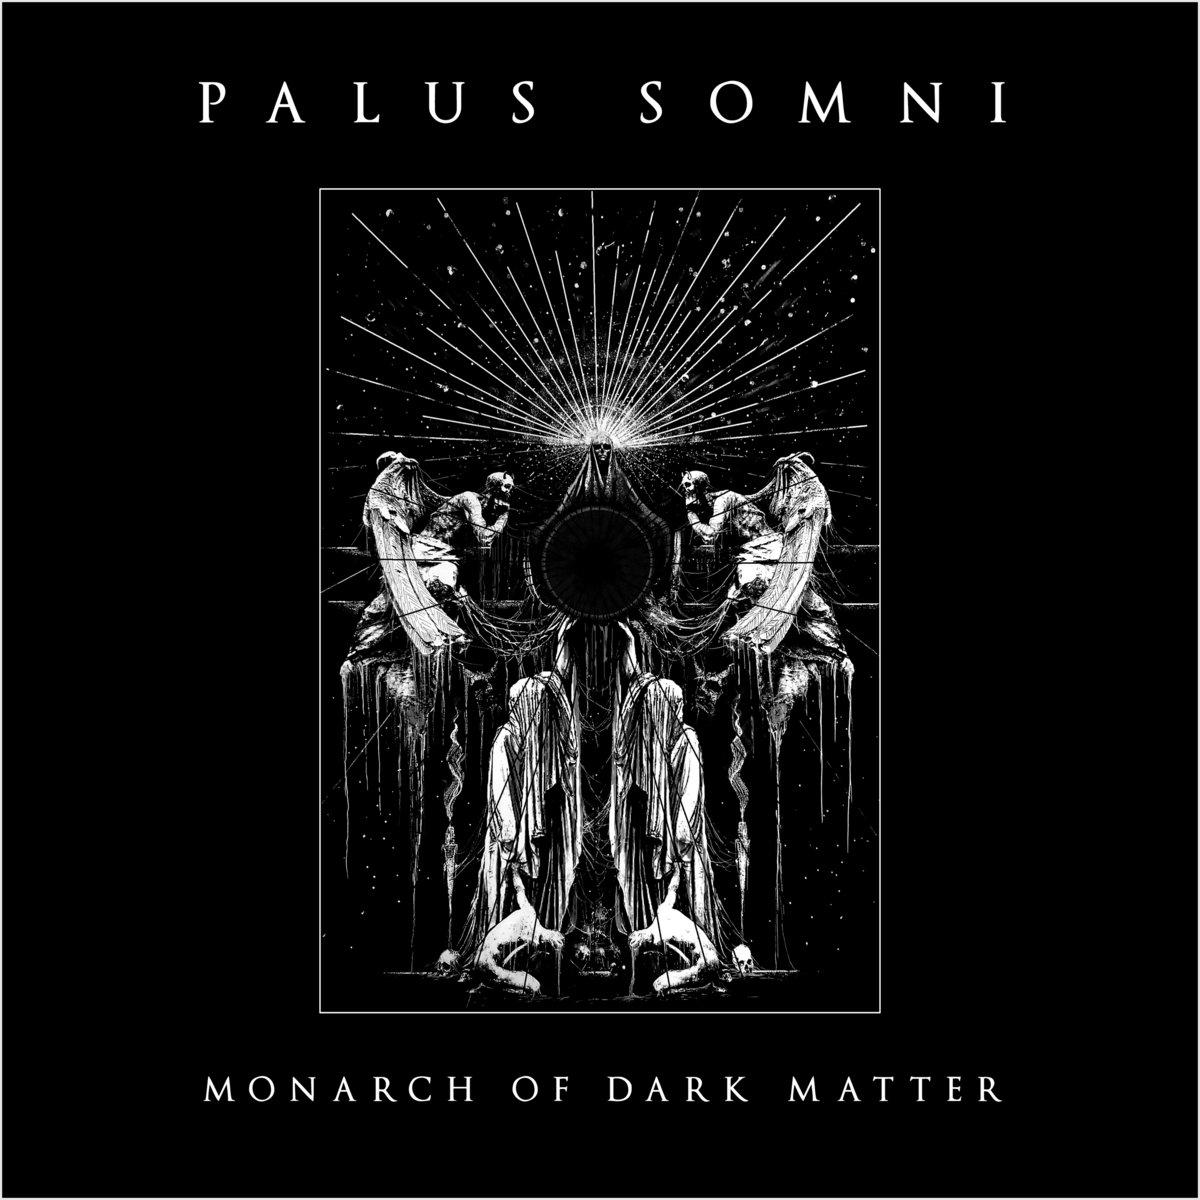 Monarch of Dark Matter Palus Somni Album Cover Artwork